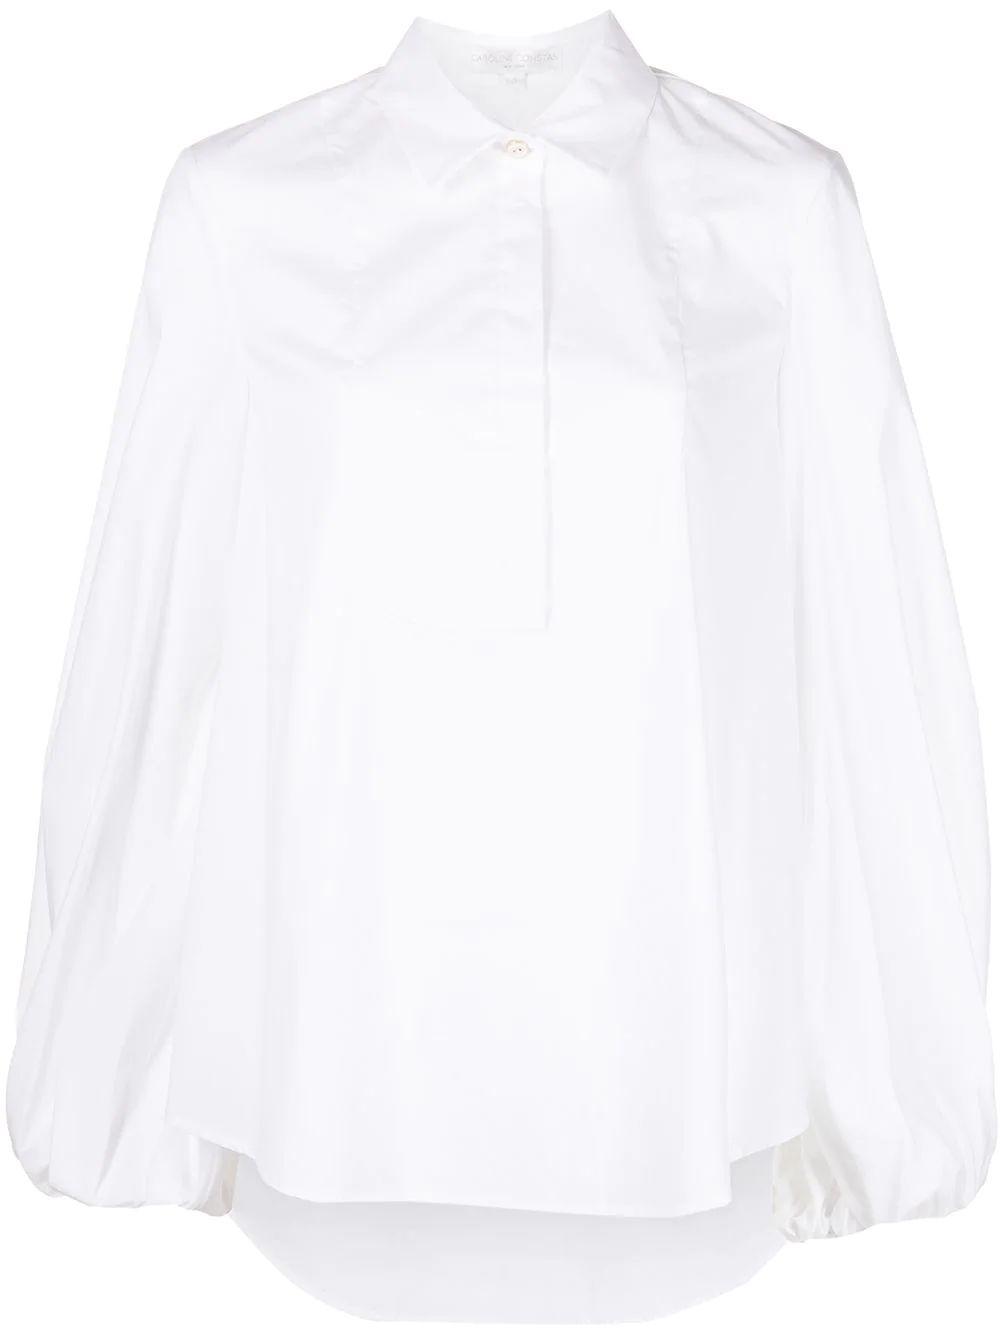 Kensley Puff Sleeve Shirt Item # T396ISSS21-S21